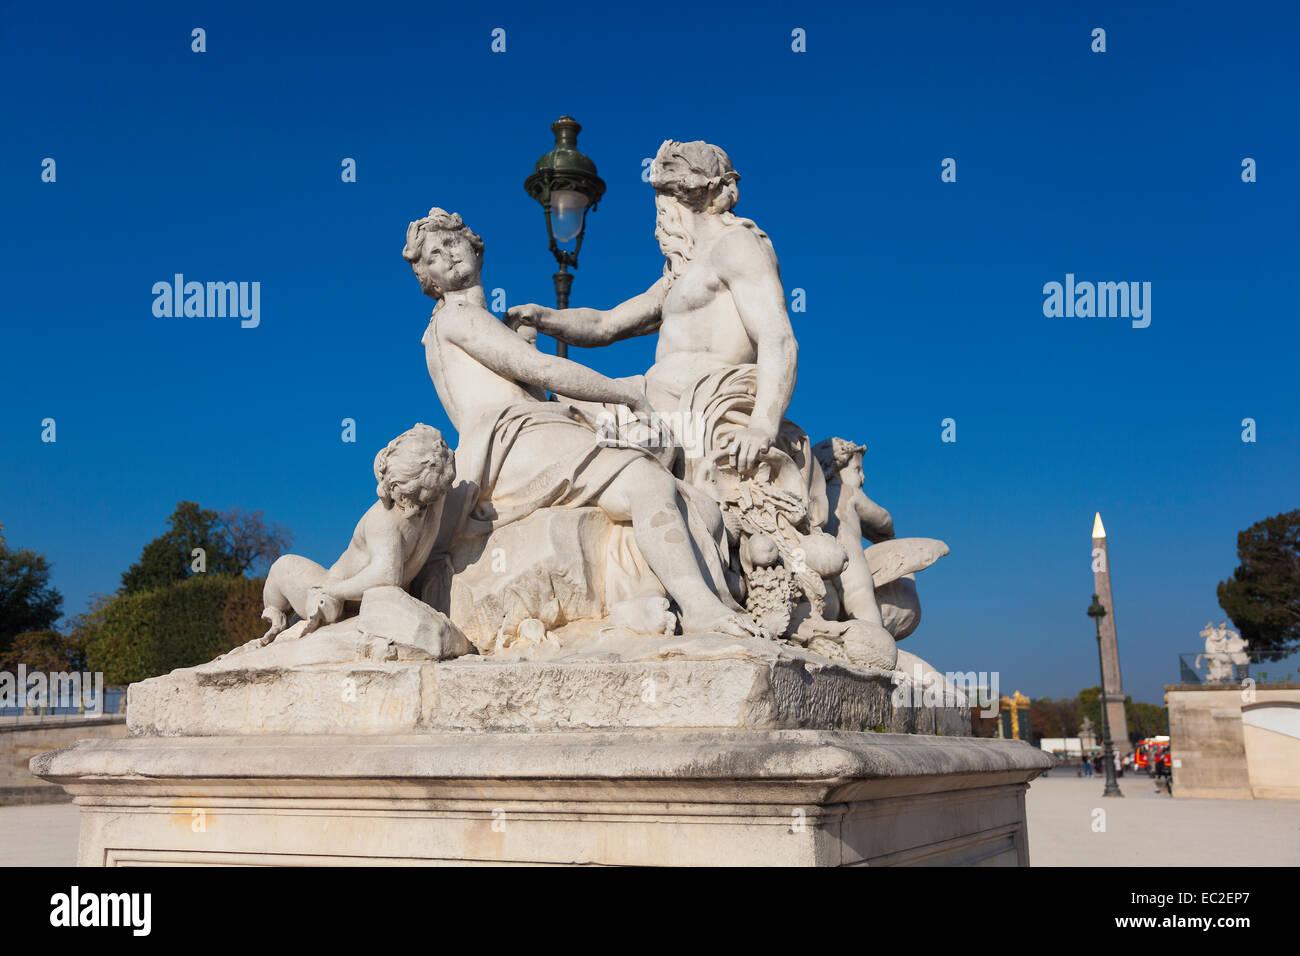 Statue in the Tuilleries, Paris, Ile-de-france, France - Stock Image